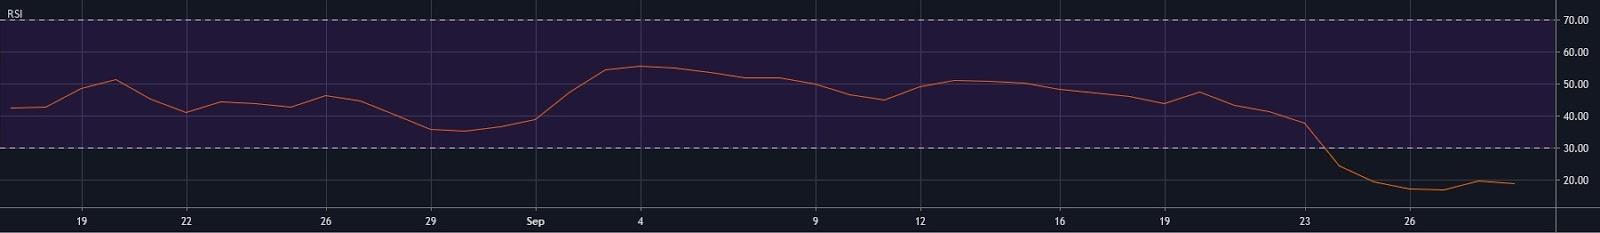 BTC/USD Daily RSI